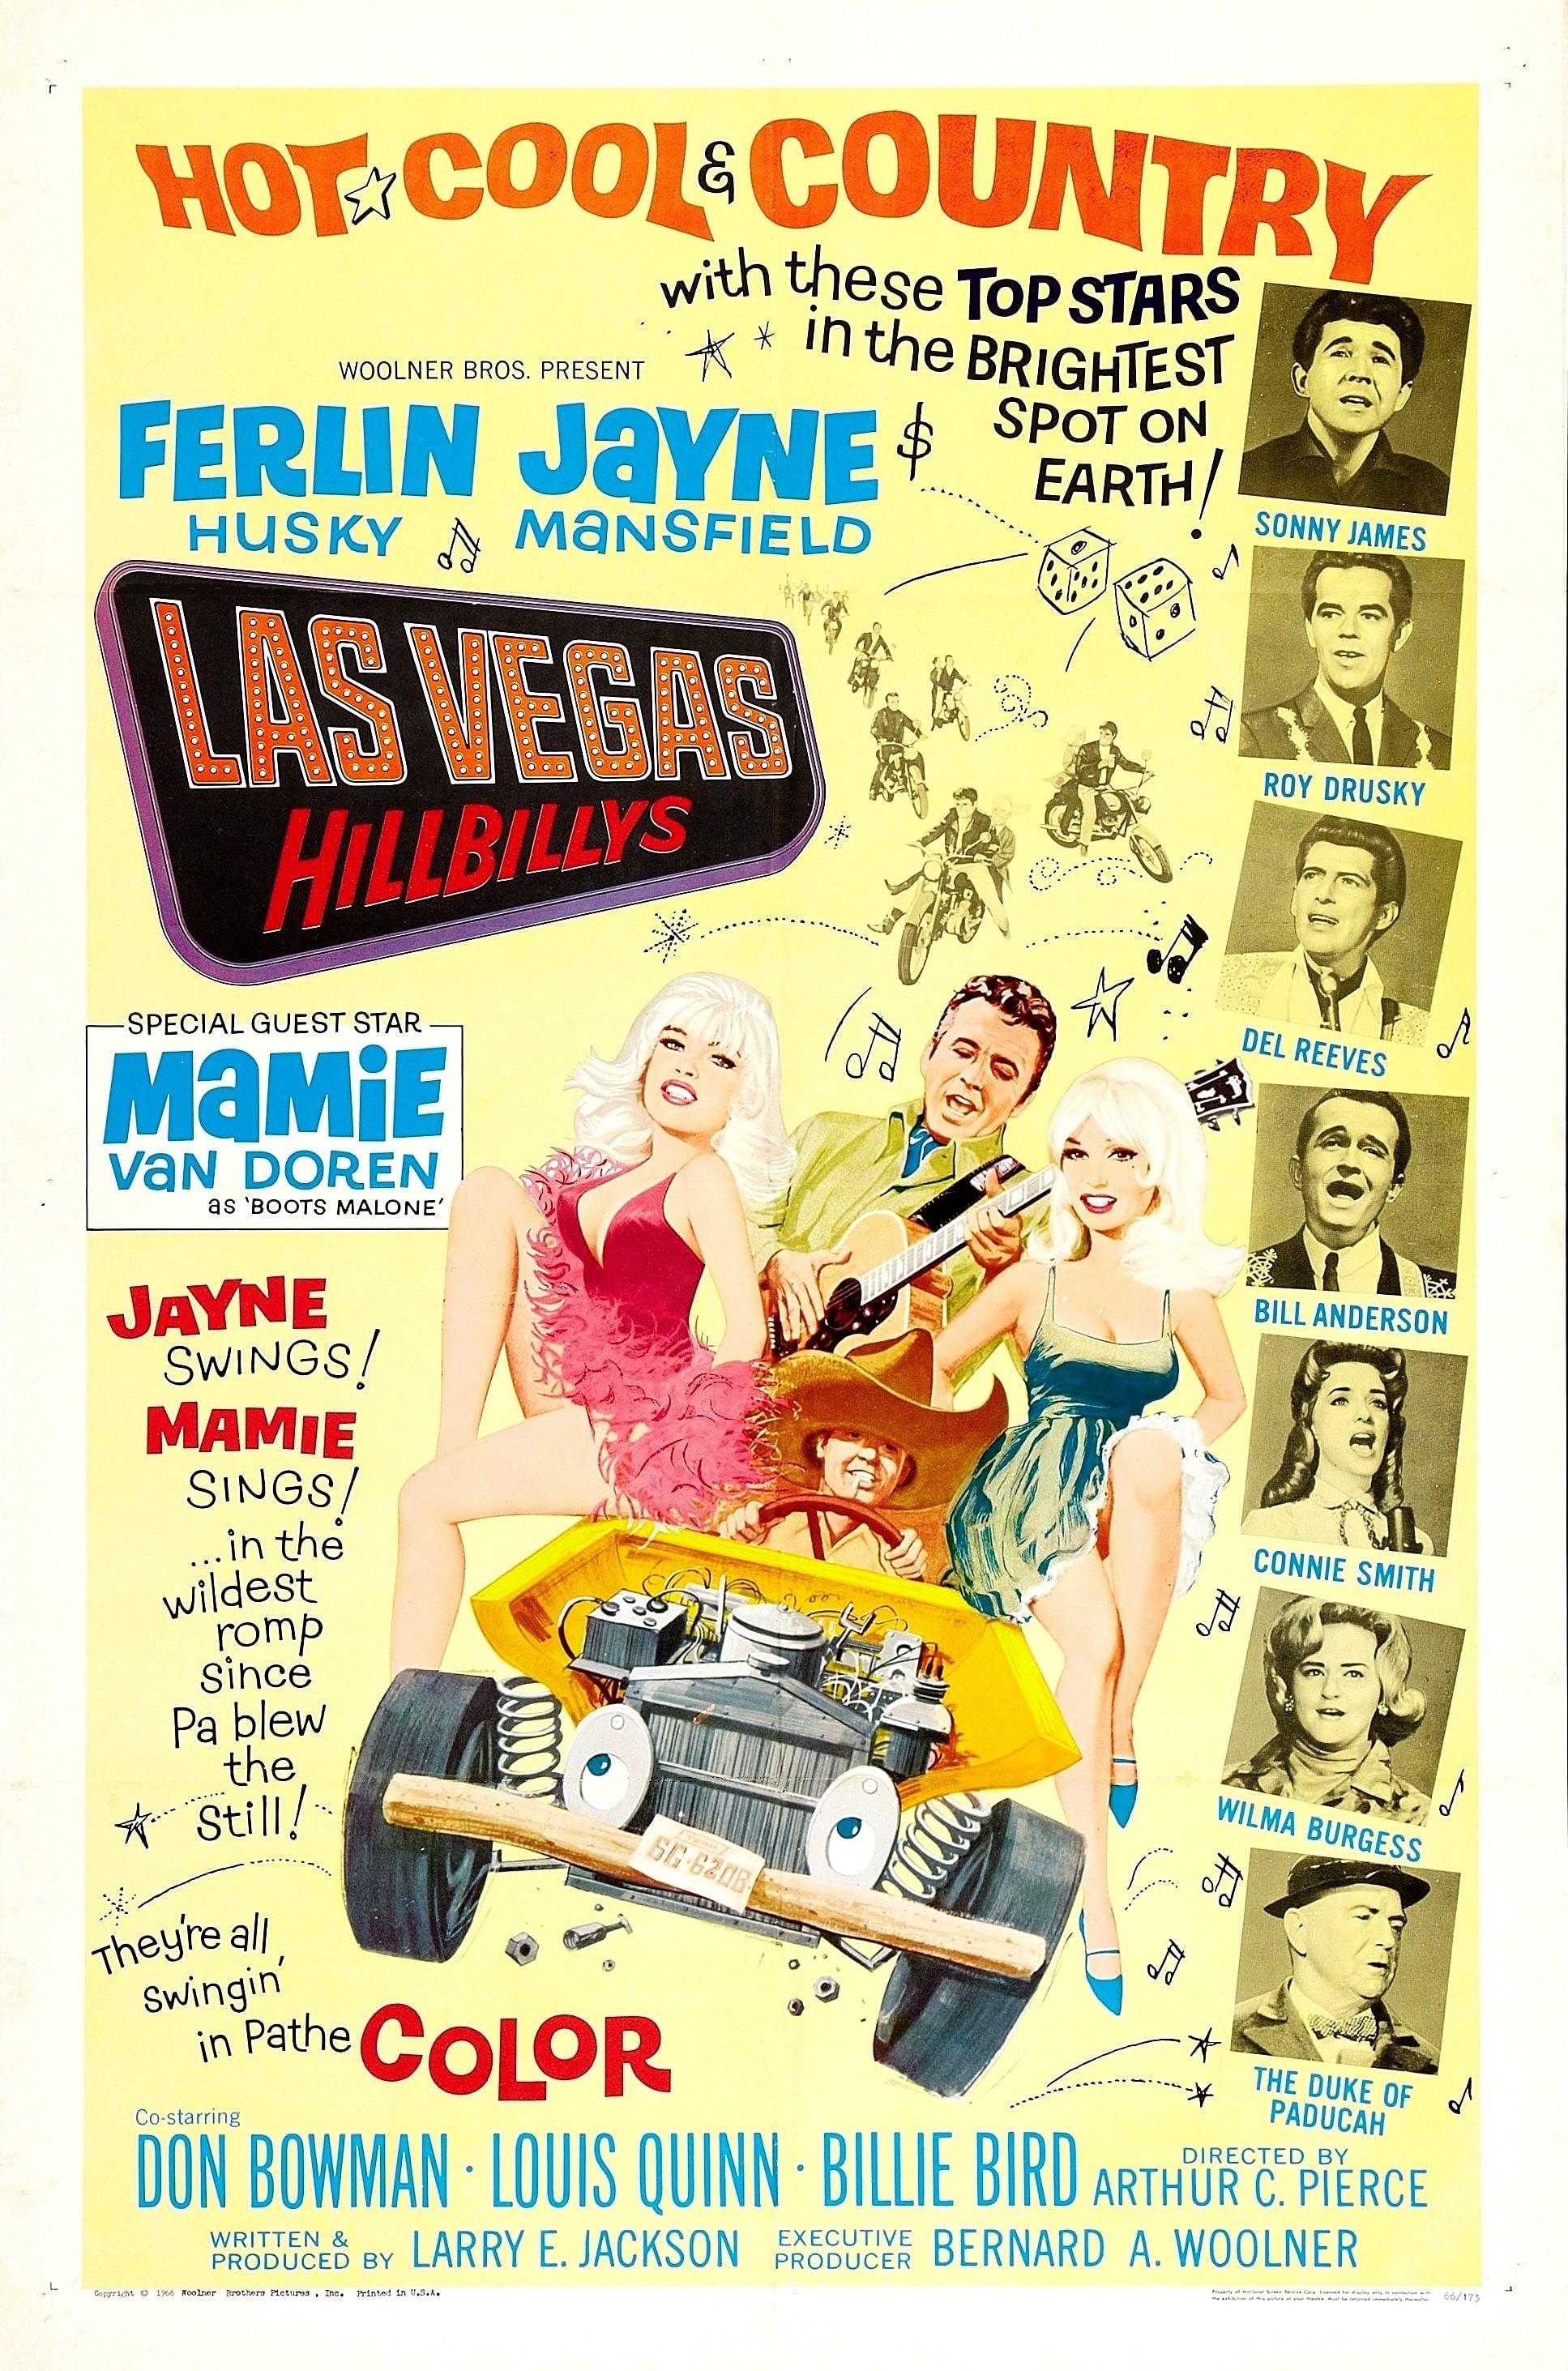 The Las Vegas Hillbillys